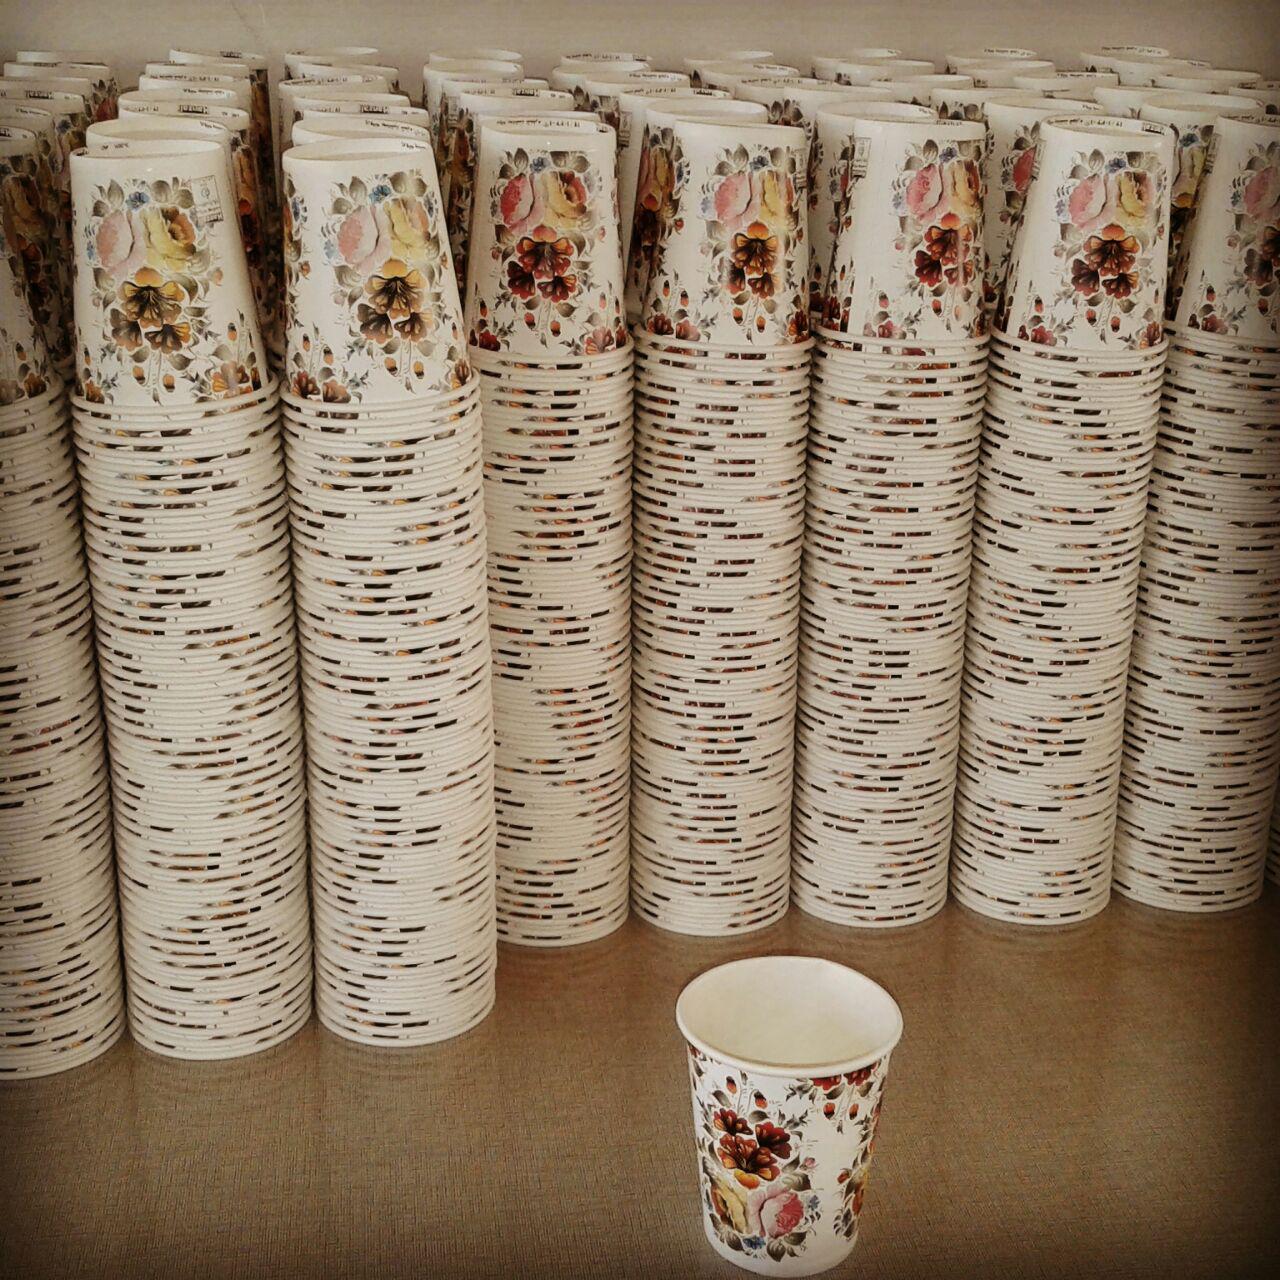 قیمت لیوان کاغذی 180 سی سی